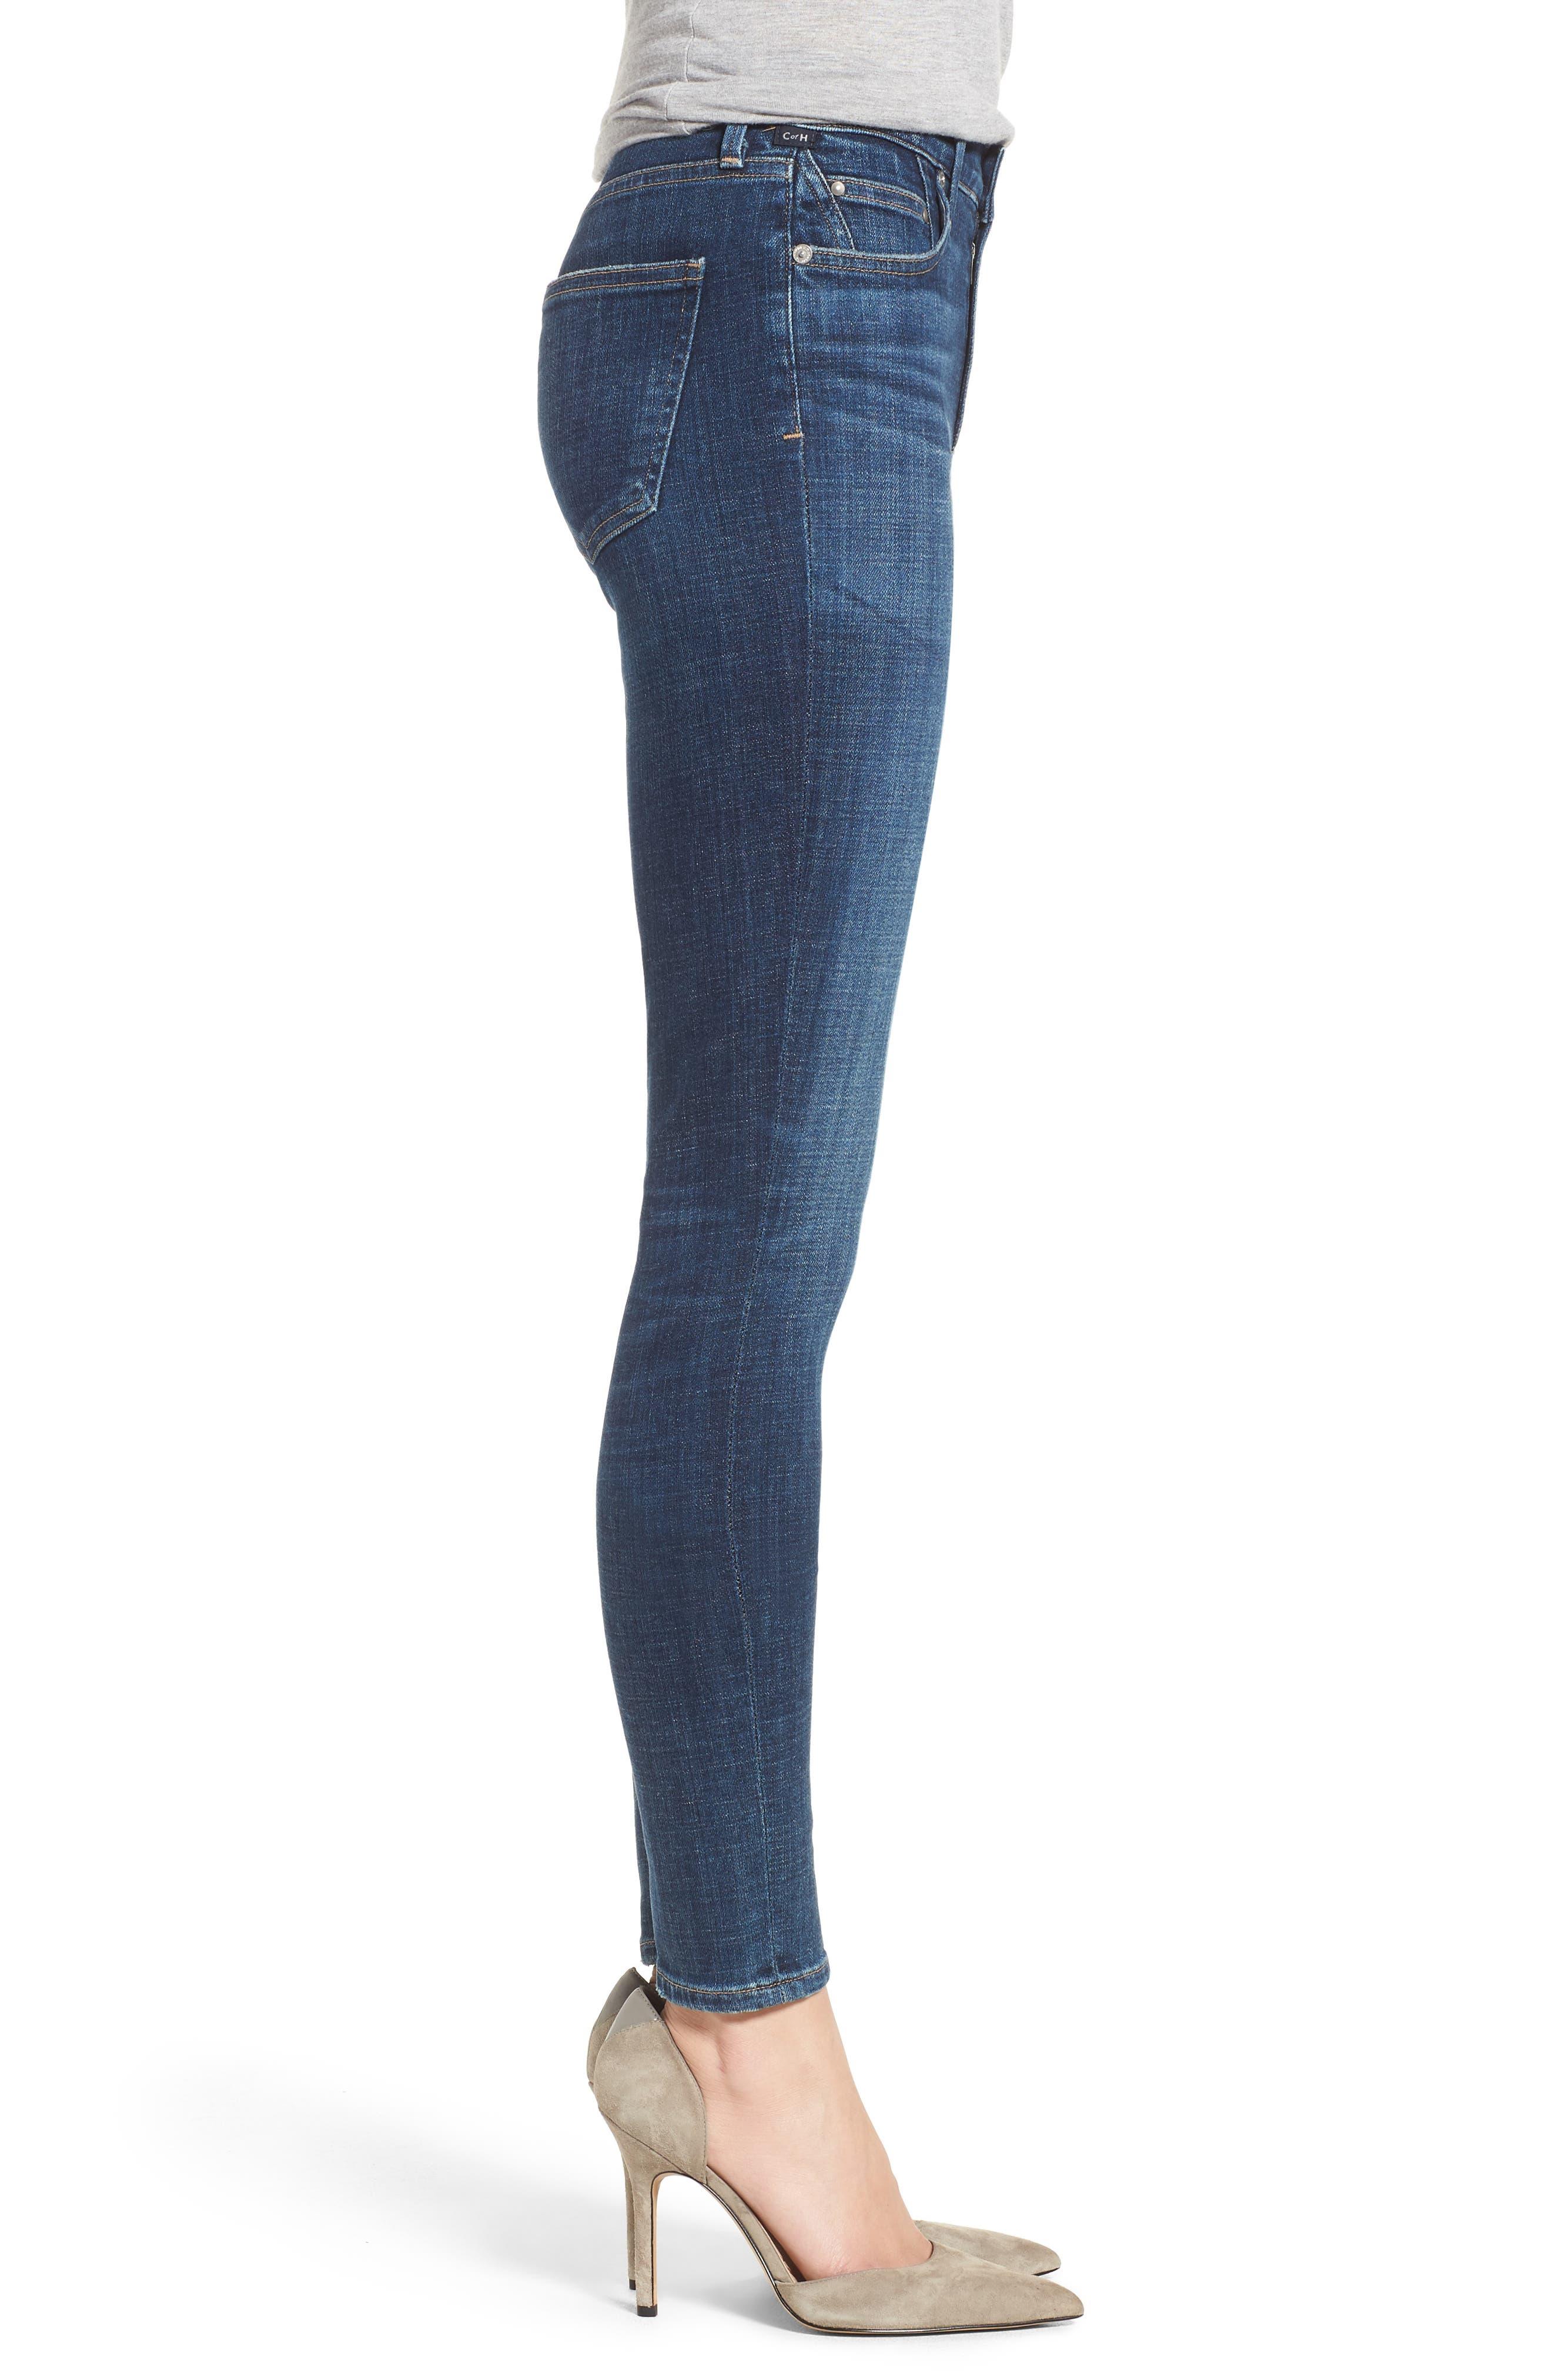 Rocket High Waist Skinny Jeans,                             Alternate thumbnail 3, color,                             428